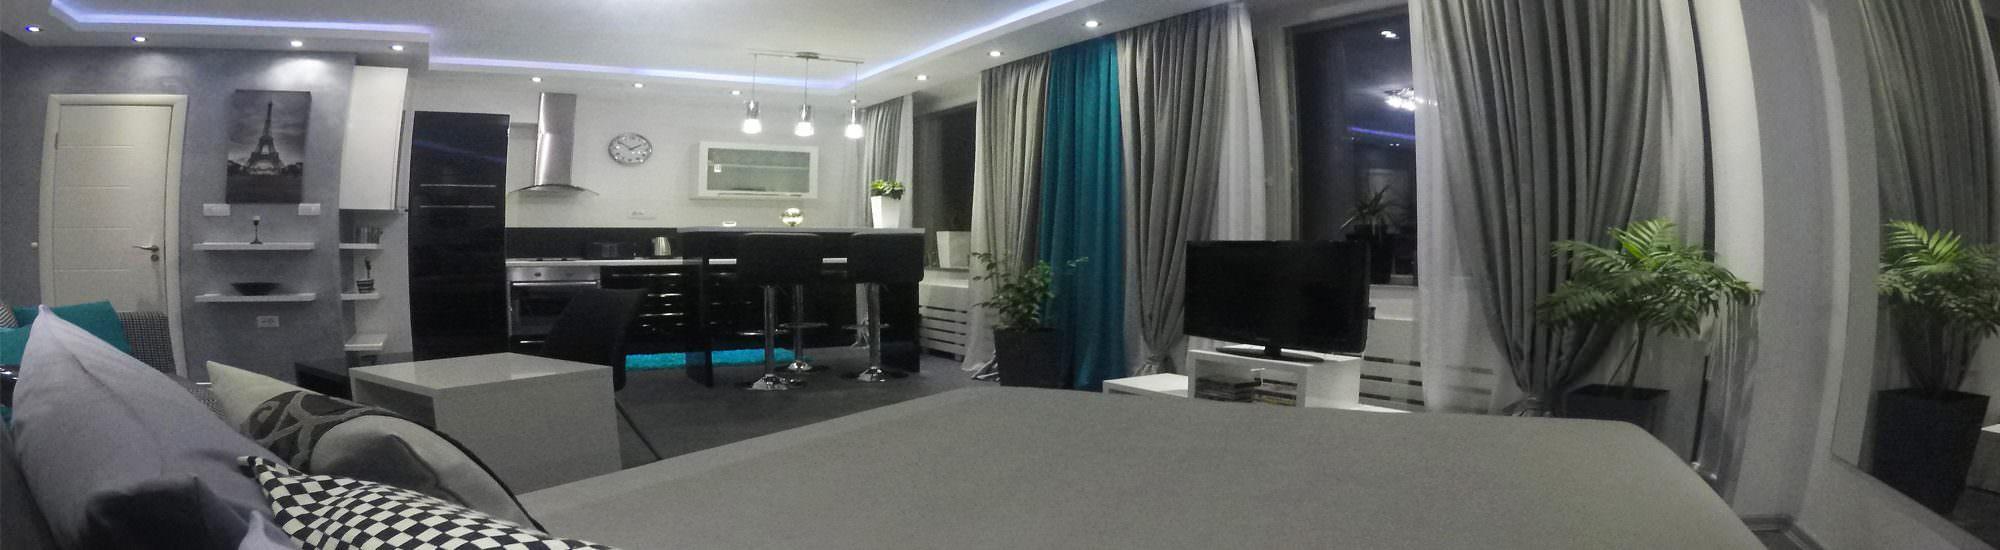 Lukas apartmani Beograd 15